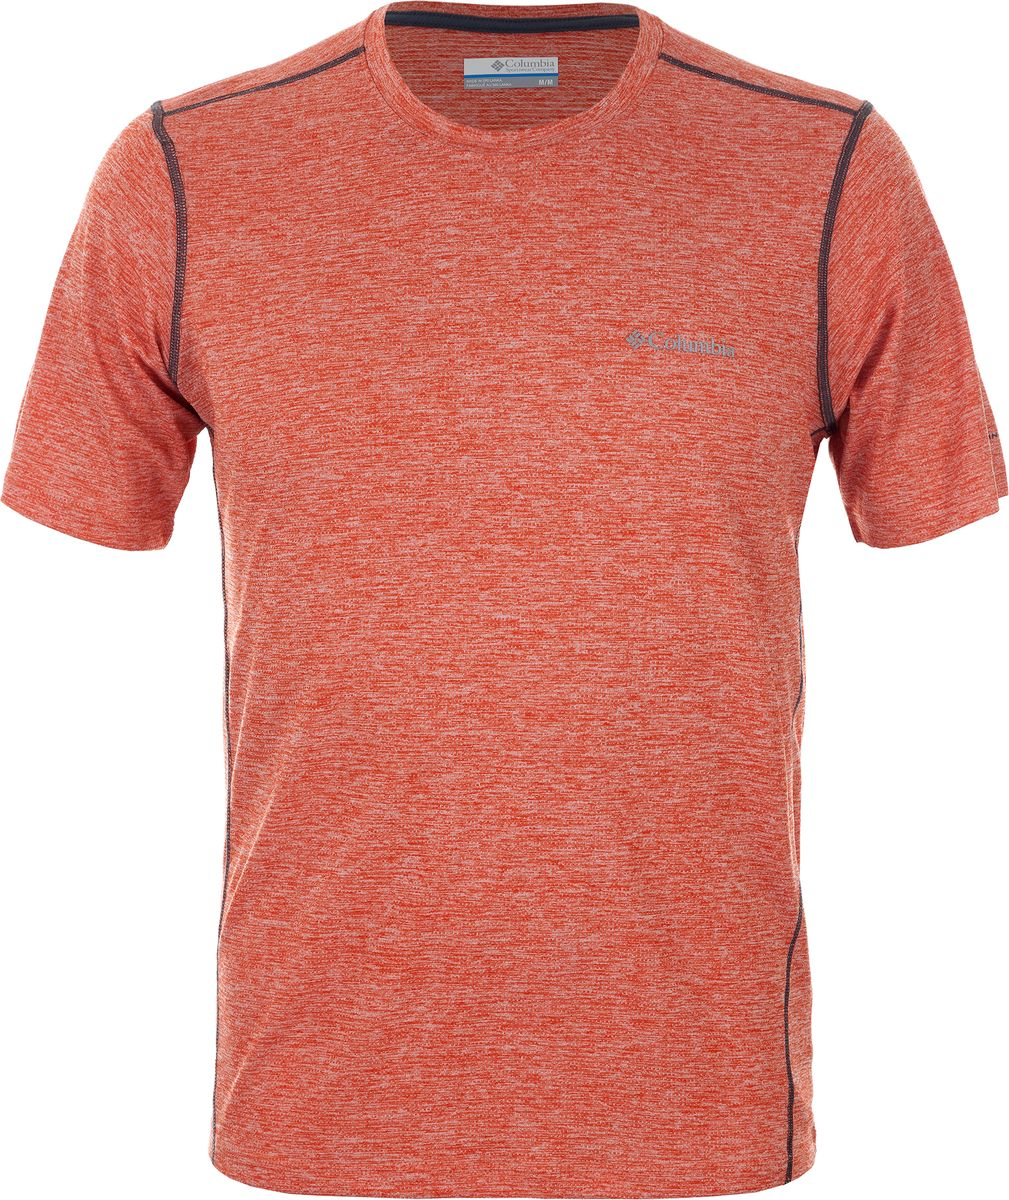 Футболка мужская Columbia Deschutes Runner SS Shirt, цвет: оранжевый. 1711781-805. Размер XXL (56/58) мужская одежда для спорта